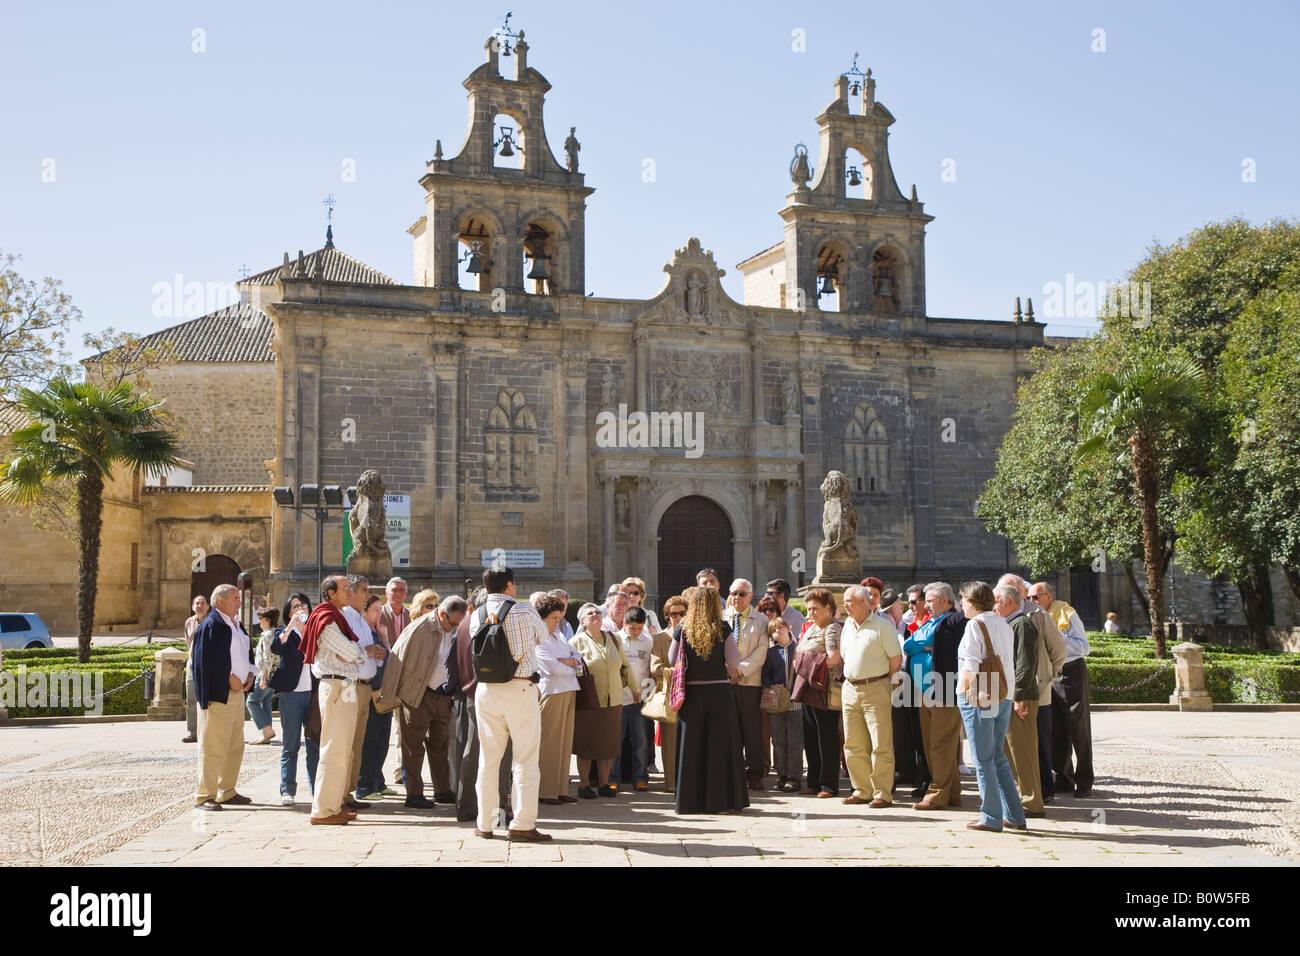 Ubeda Jaen Province Spain Tourist group and guide in front of Iglesia de Santa Maria de los Alcázares - Stock Image